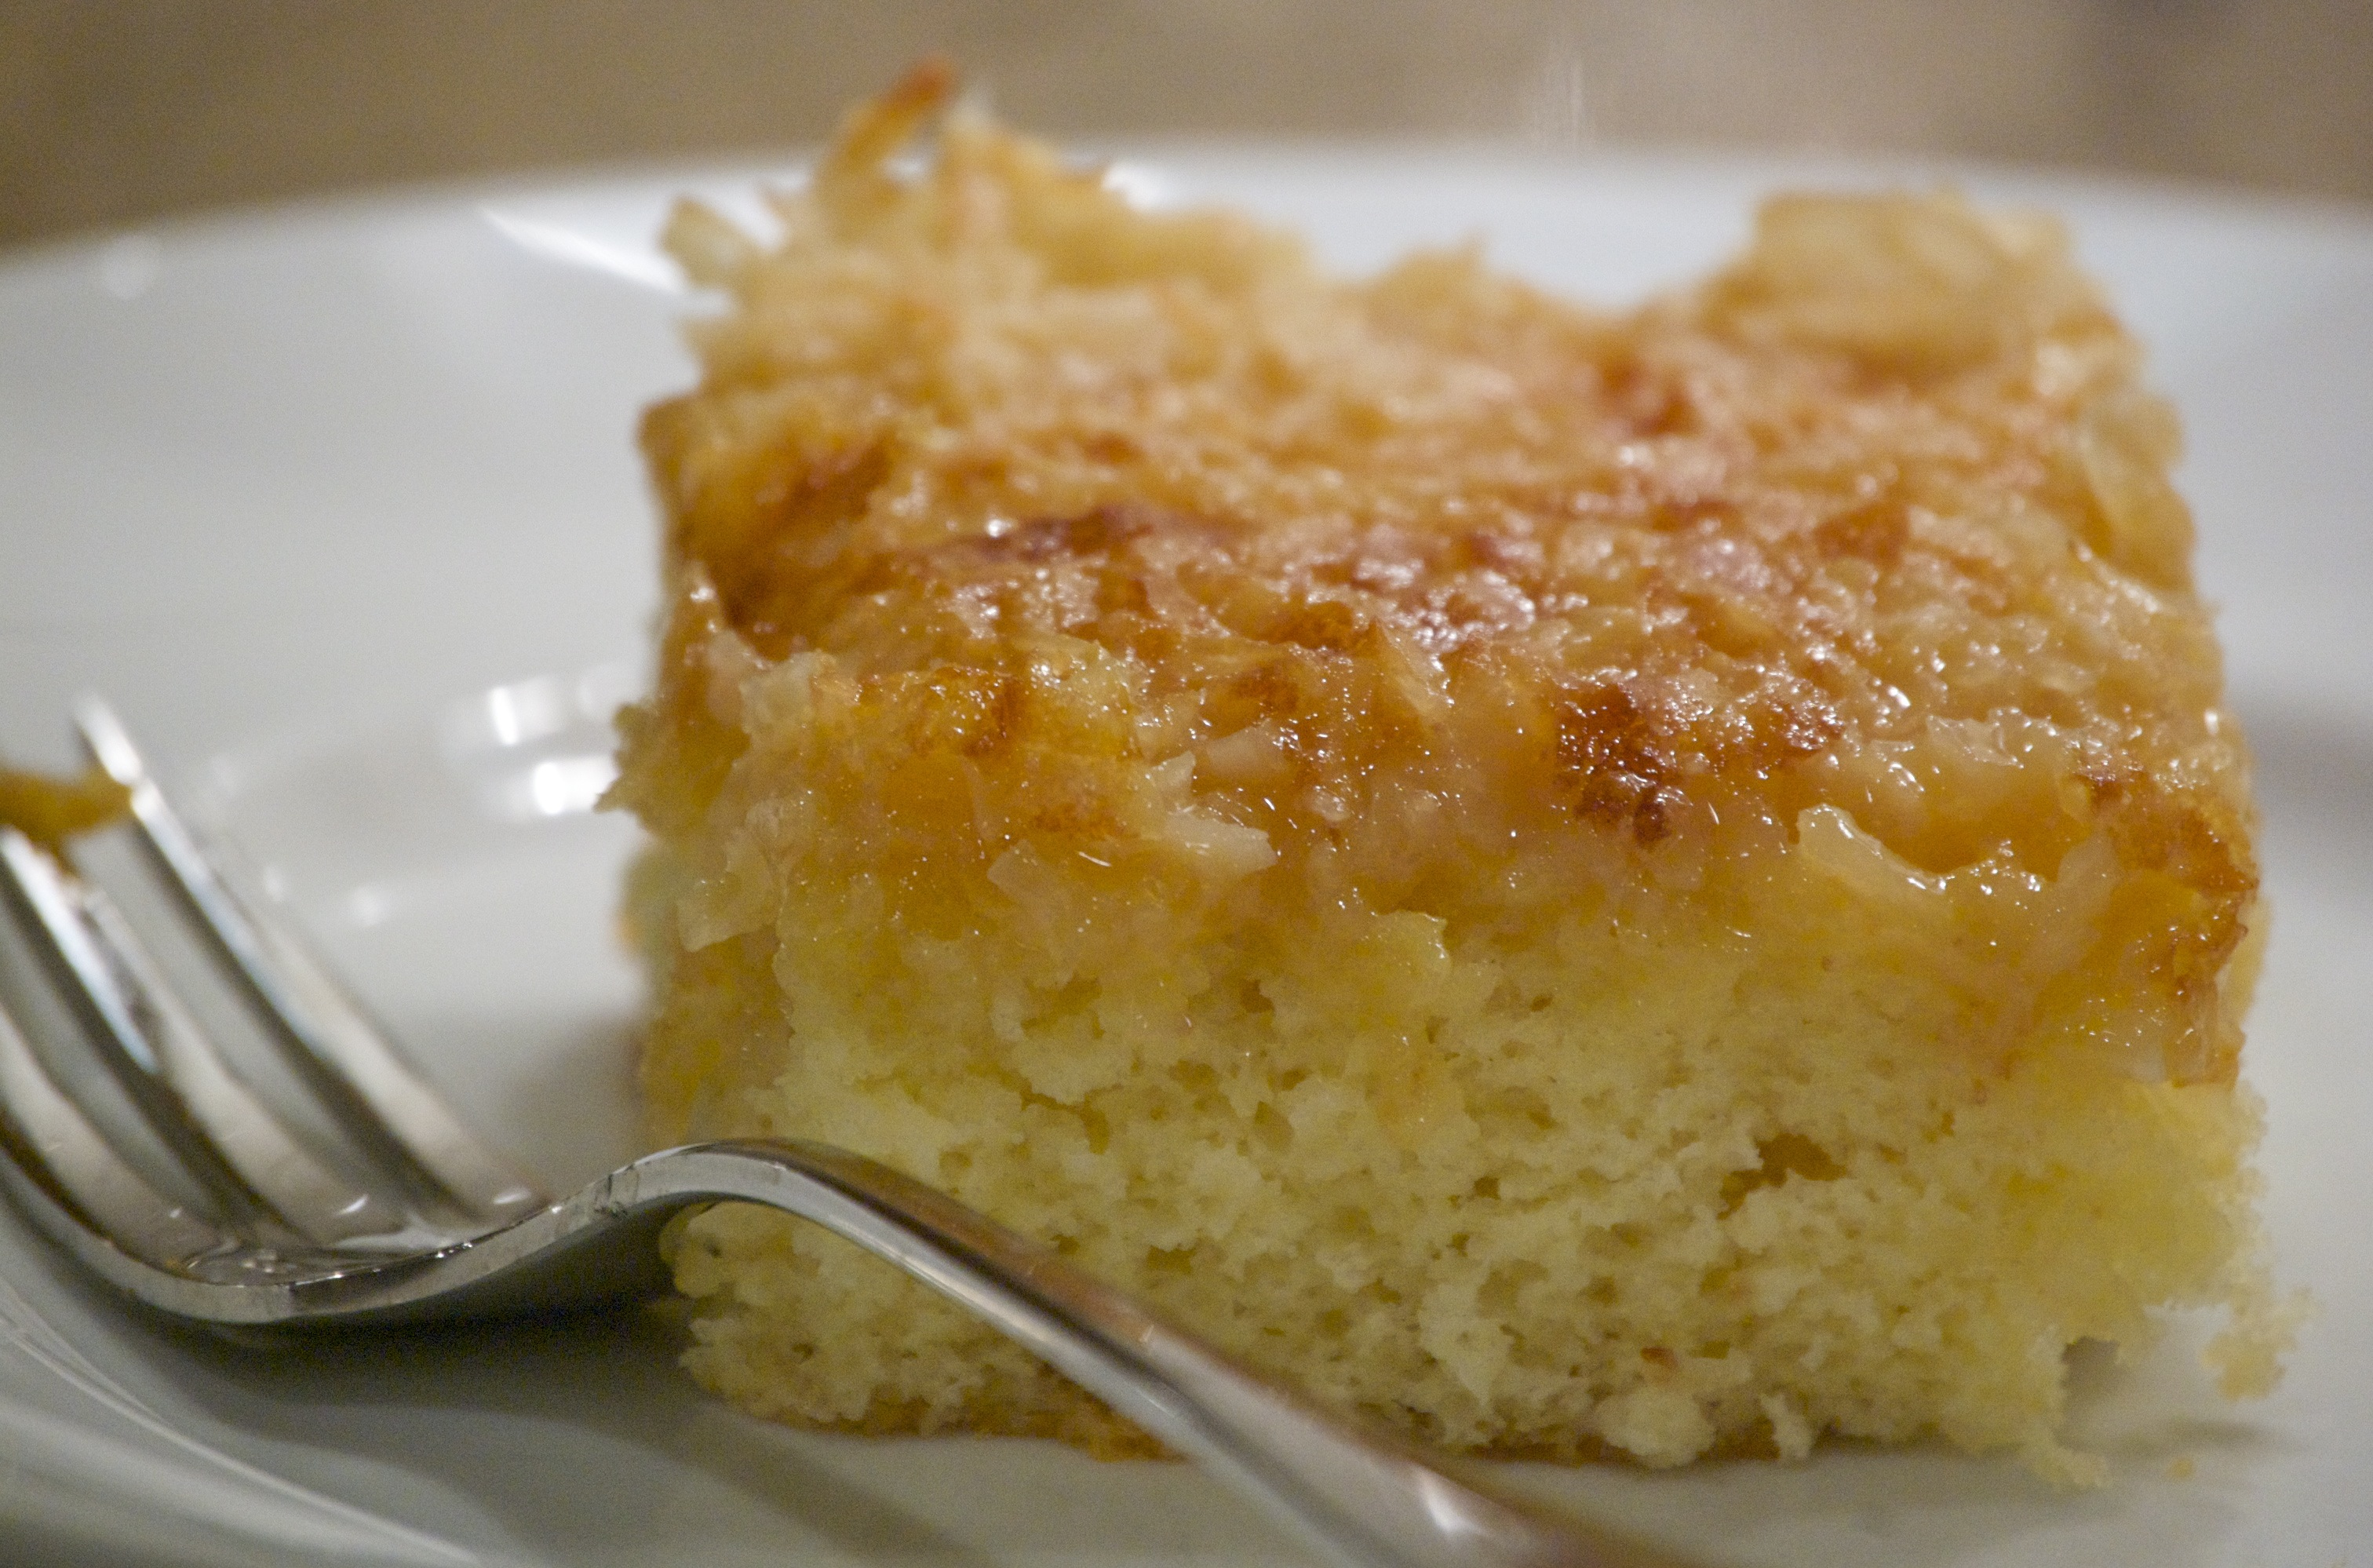 http://www.kuhar.ba/recepti/deserti/kolaci/topli-mlijecni-kolac/